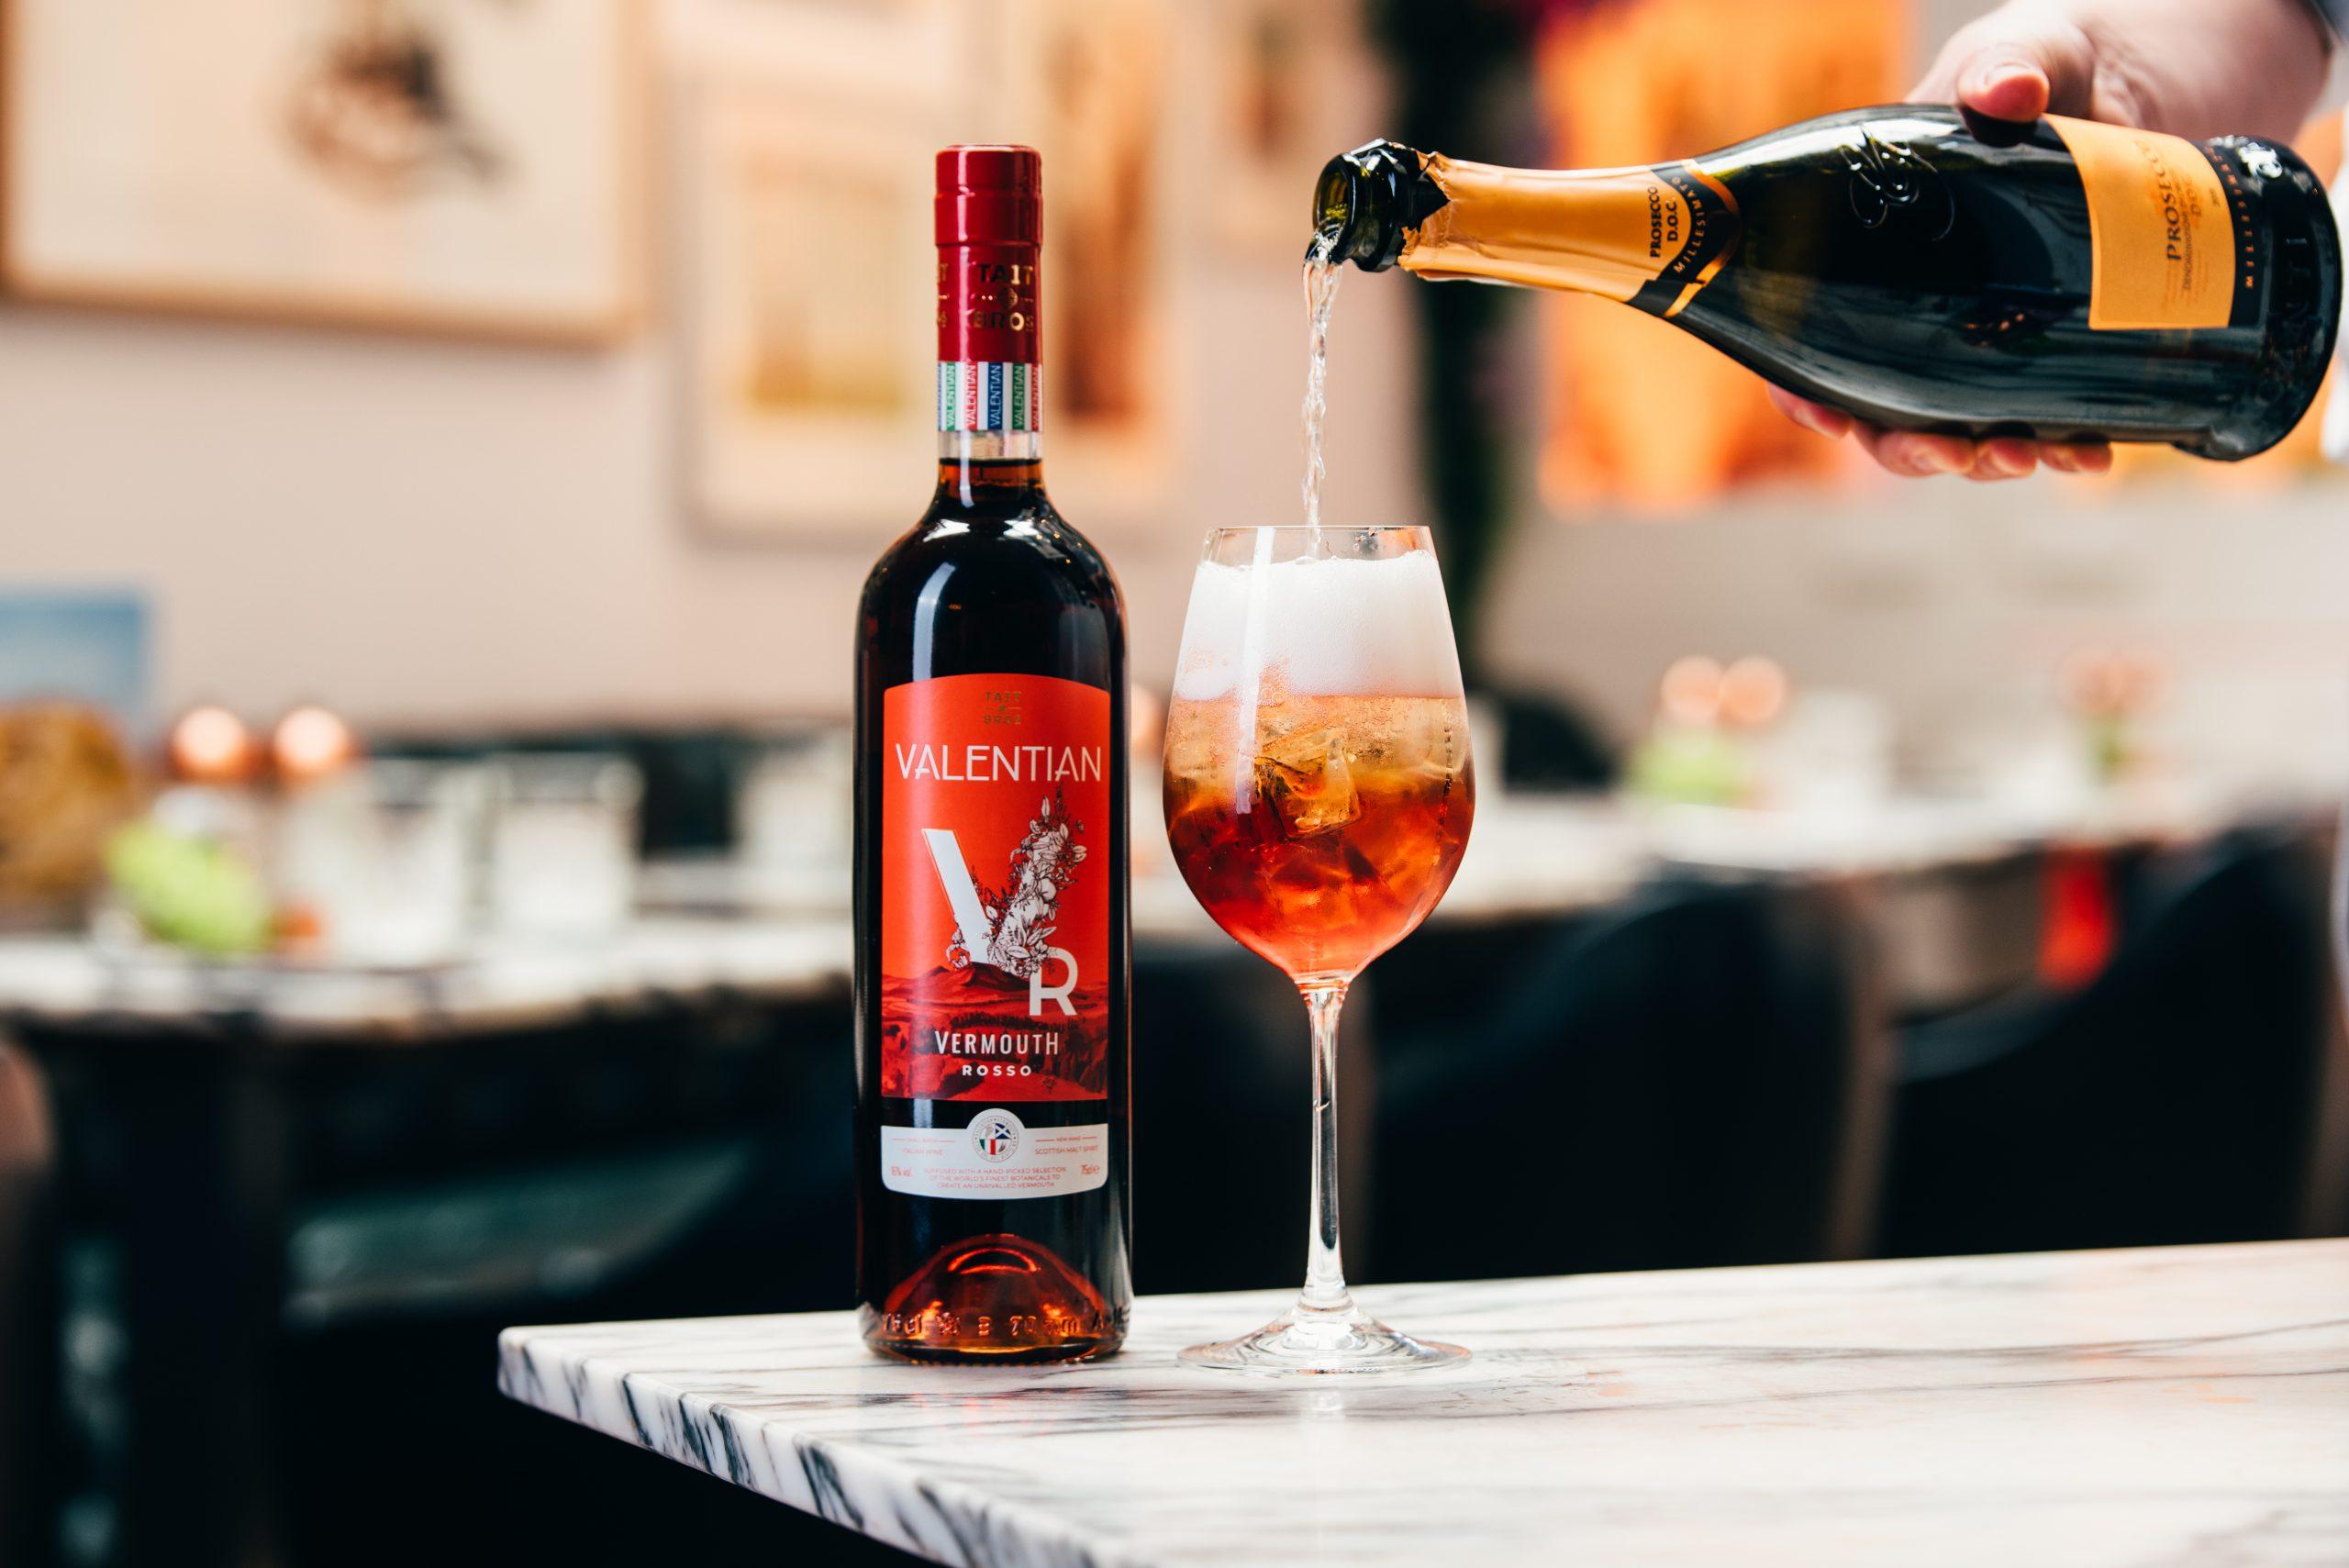 Bar 4 Valentian Spagliato (served up)